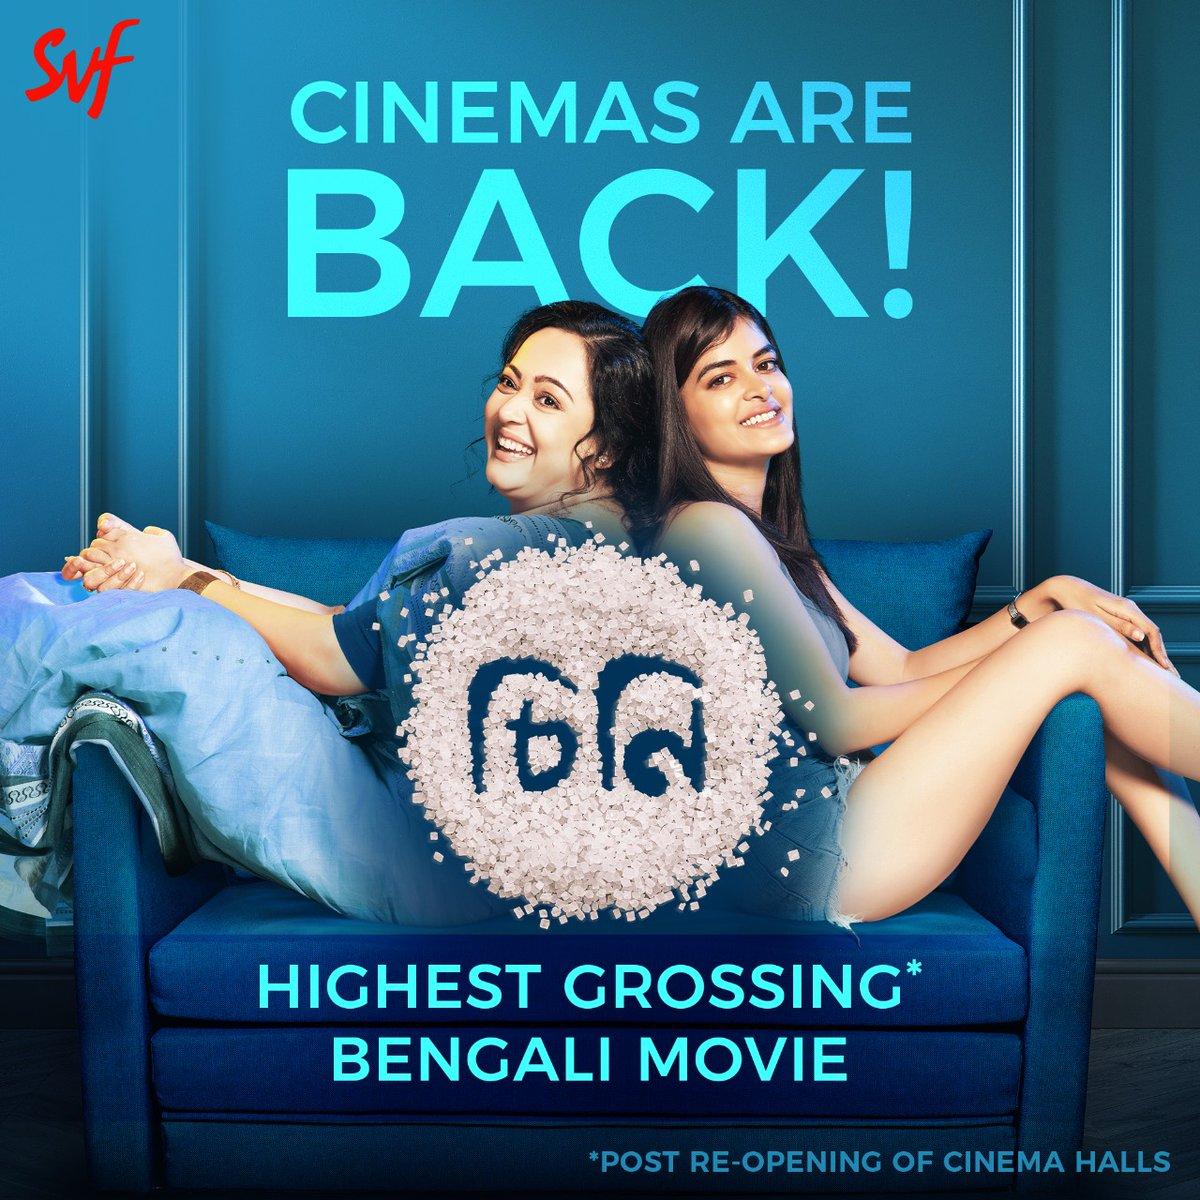 The fruits of our labour taste SWEET! 😋 #CinemasAreBack  #Cheeni running successfully at a theatre near you:  ❤️  @madhumitact @iamsaaurav @AdhyaAparajita @talkmainak @iammony